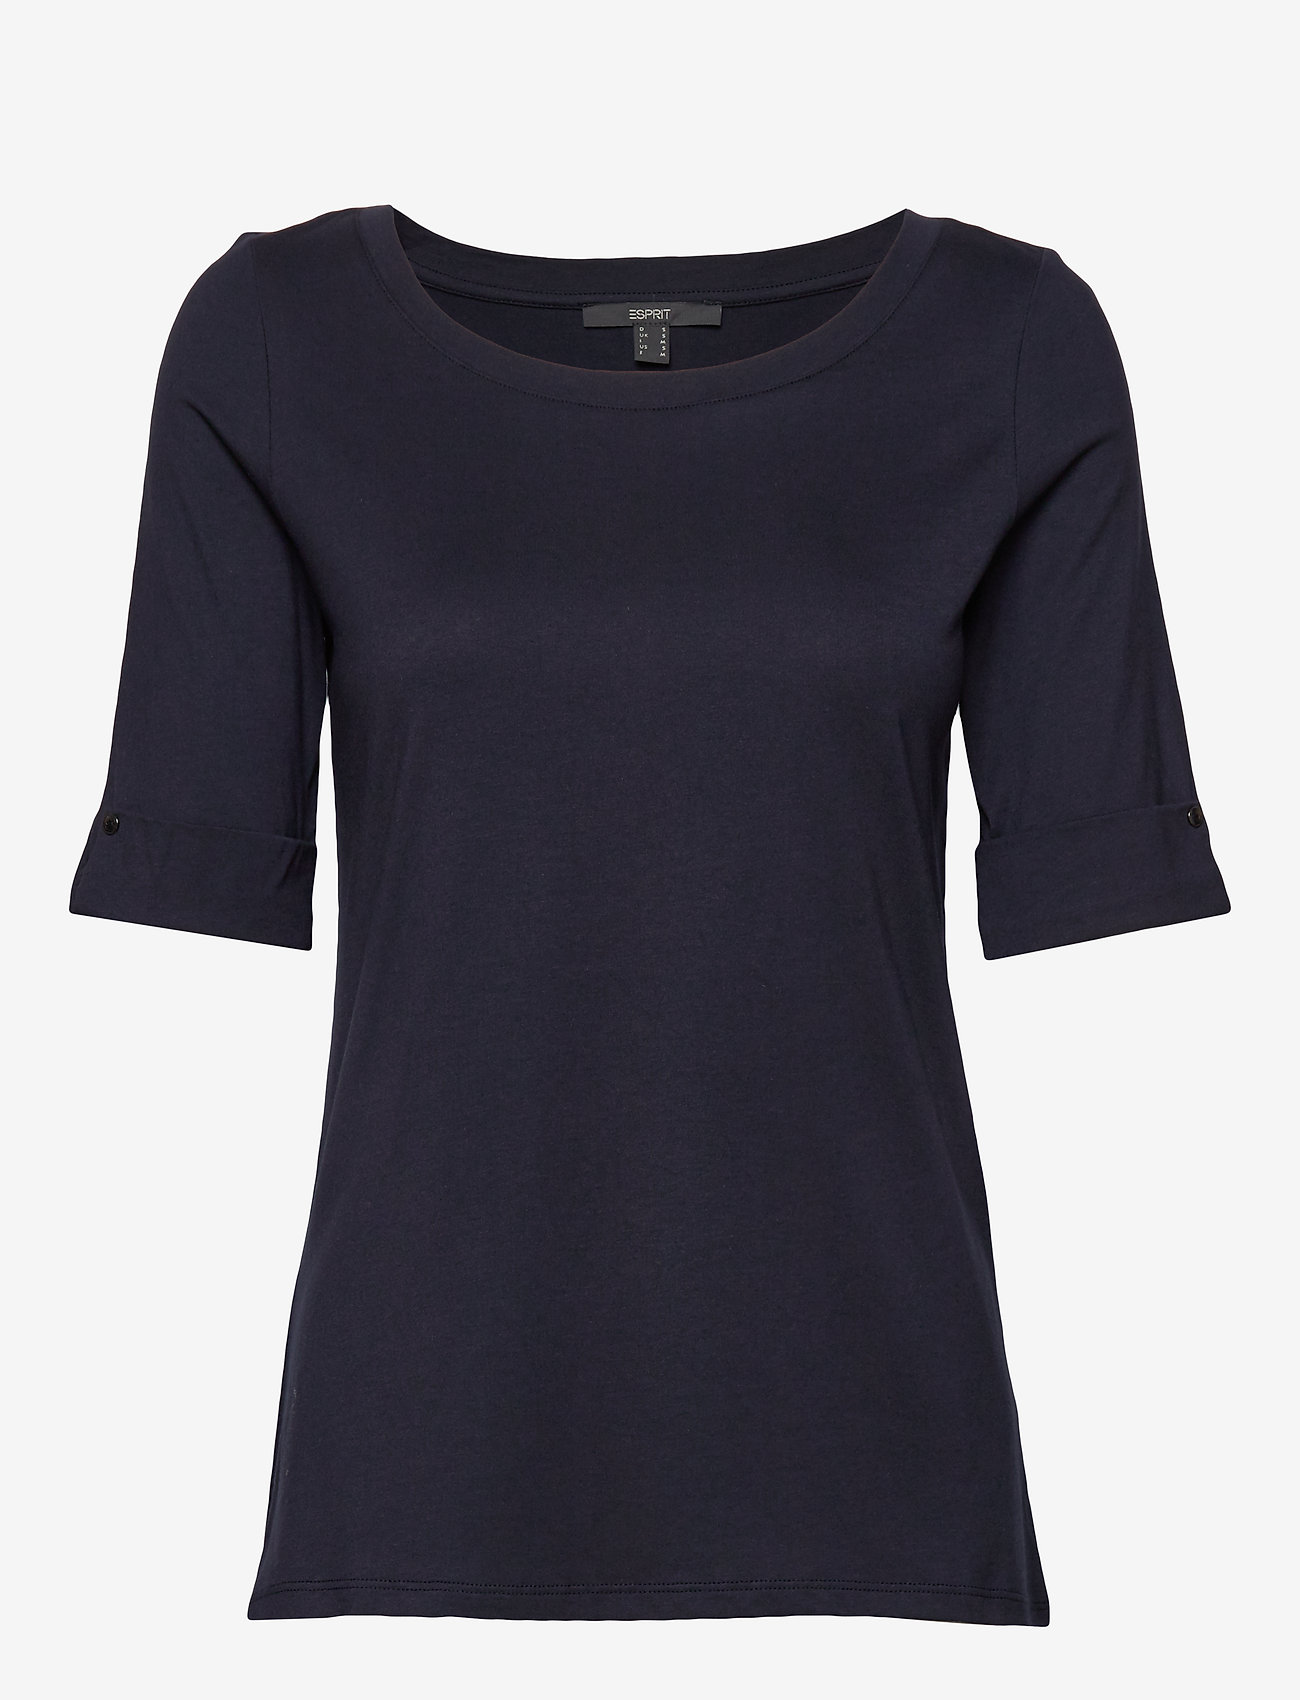 Esprit Collection - T-Shirts - basic t-shirts - navy - 0